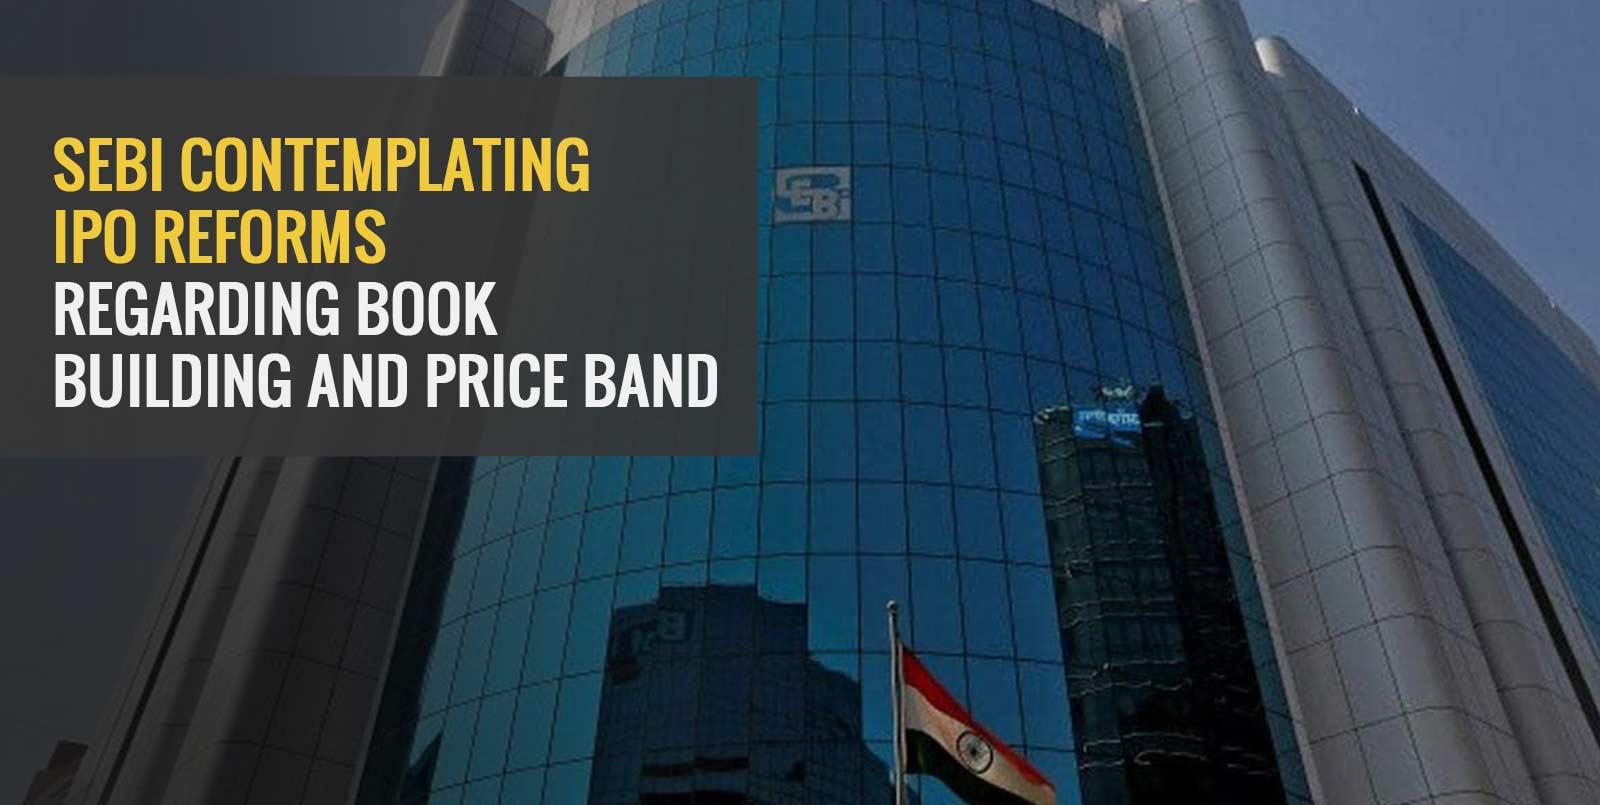 SEBI Contemplating IPO Reforms Regarding Book Building And Price Band